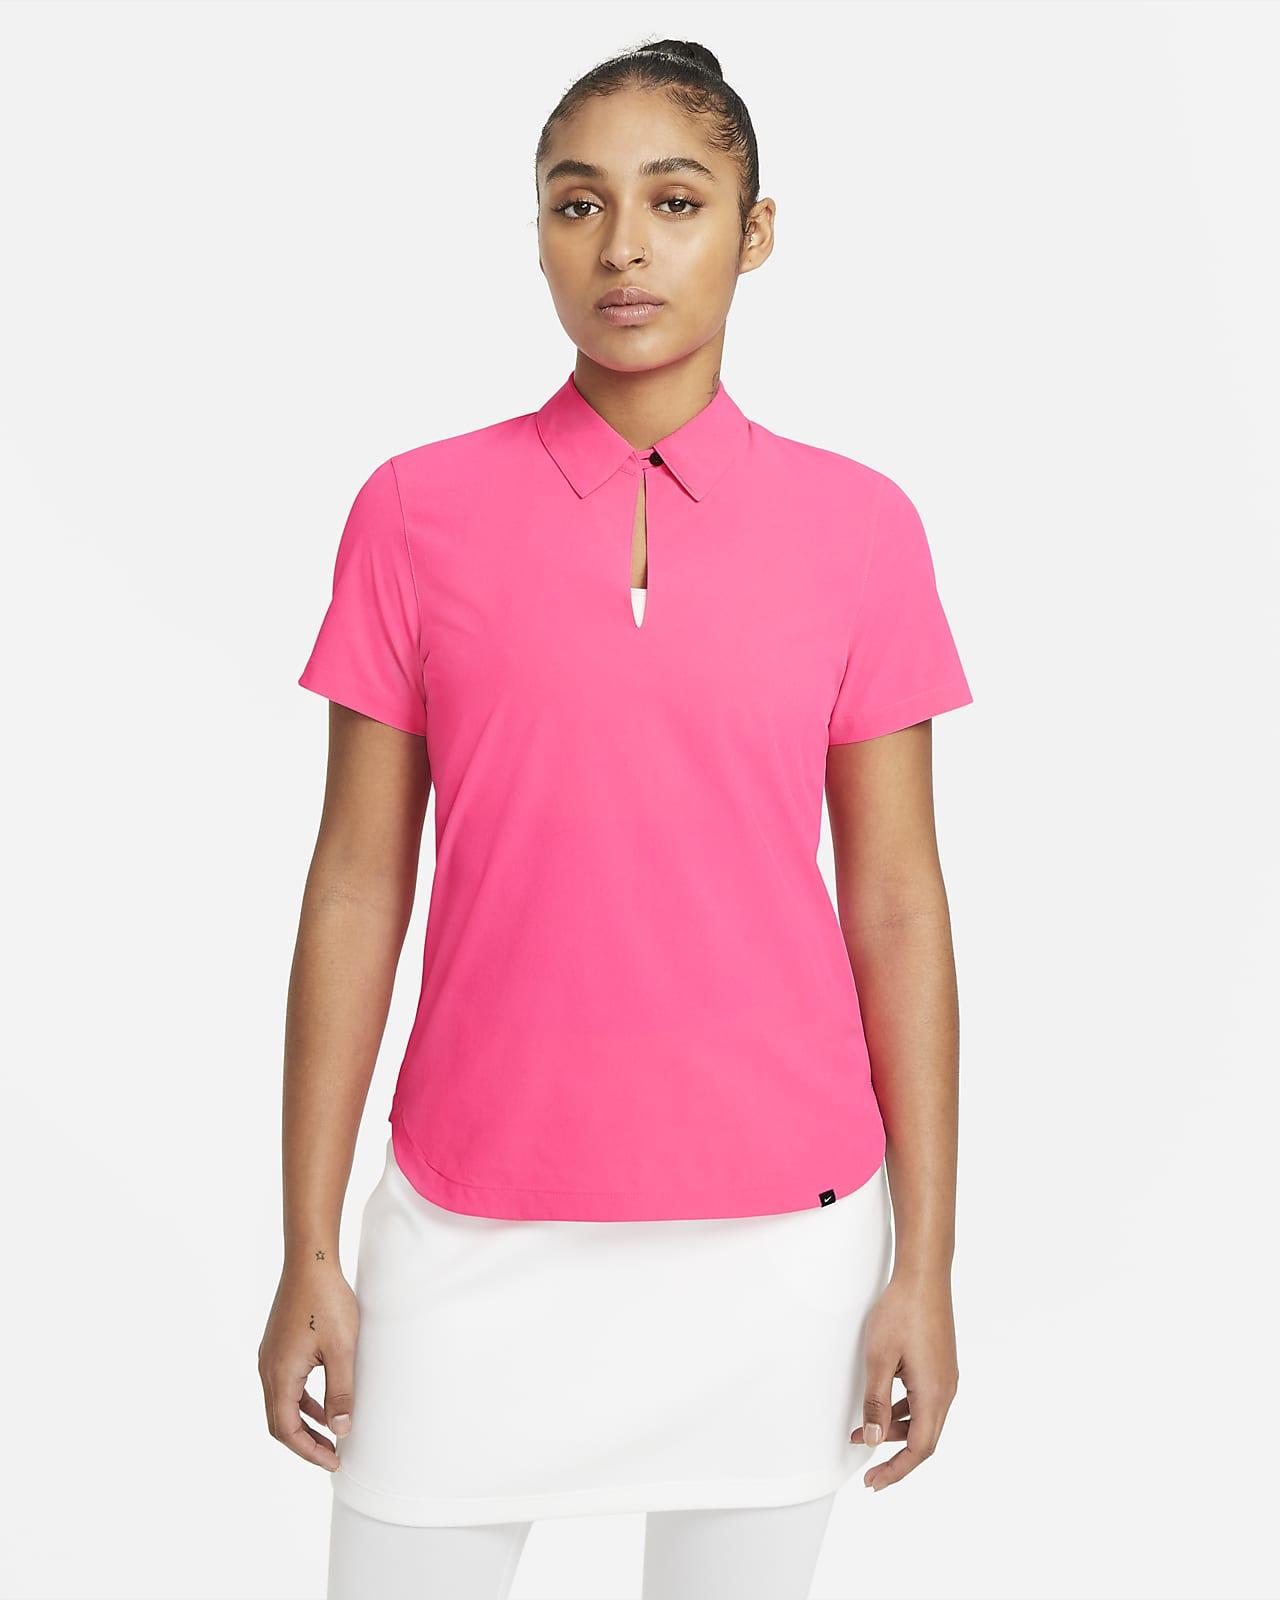 Nike Flex Ace Polo de golf - Mujer